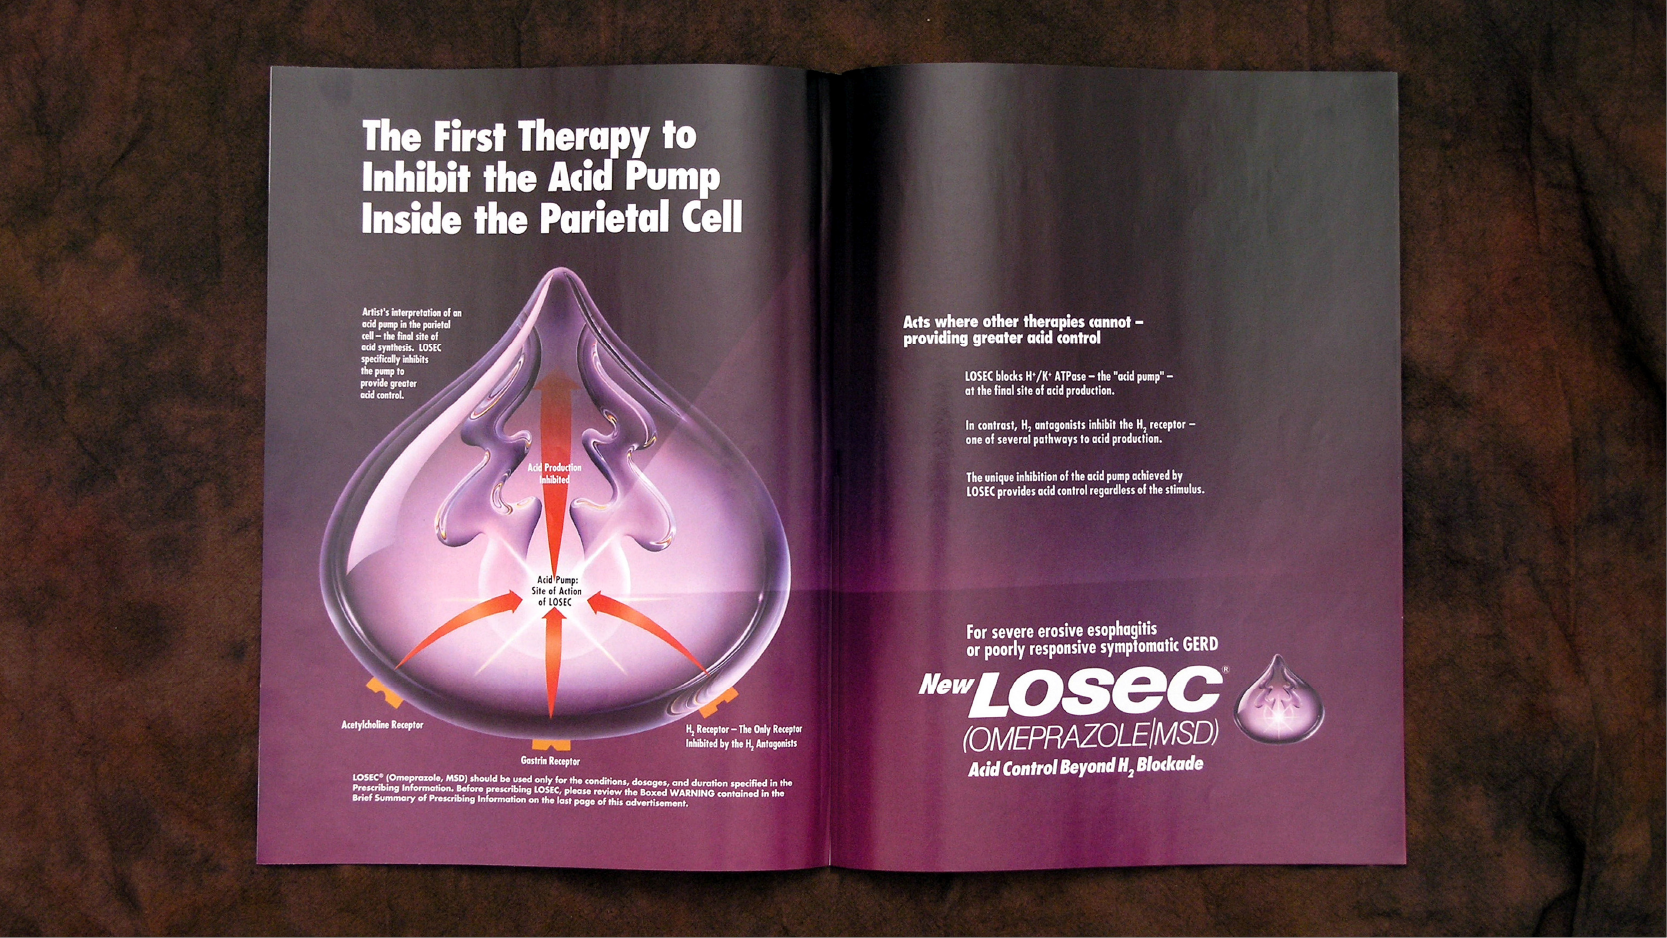 Merck Losec Launch Print Ad Spread